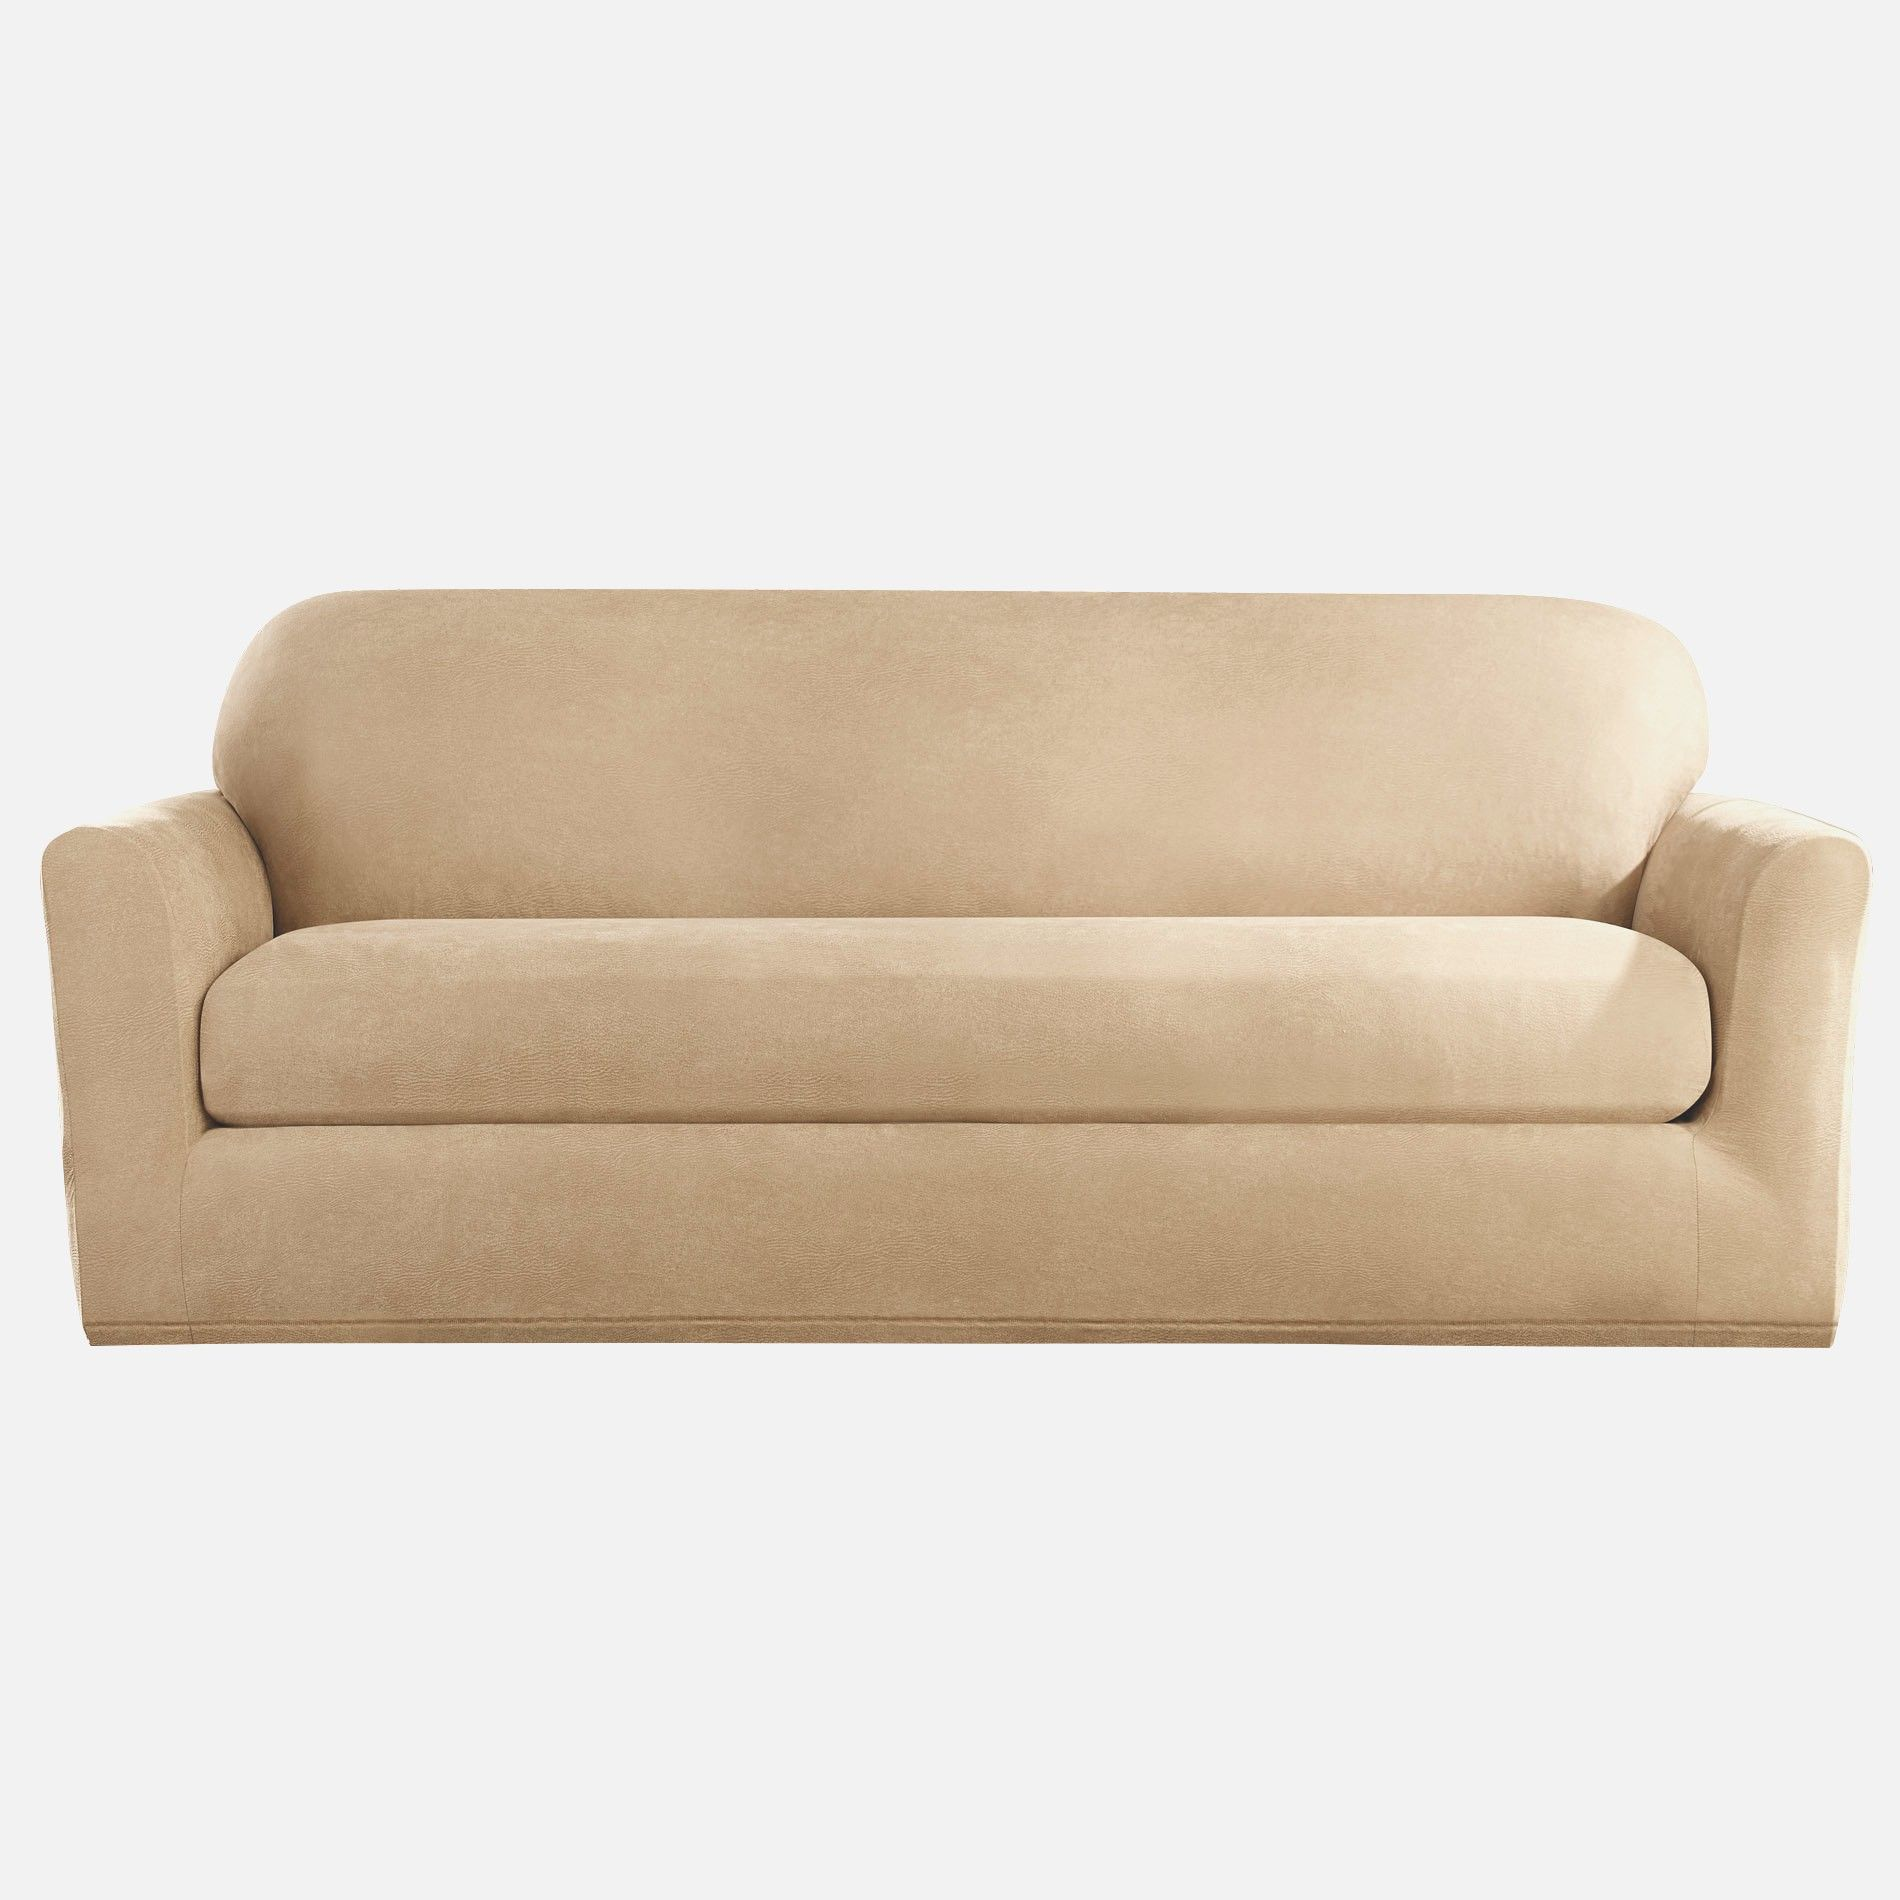 sofa slipcovers three cushions klaussner sleeper mattress options slipcover 3 cushion for